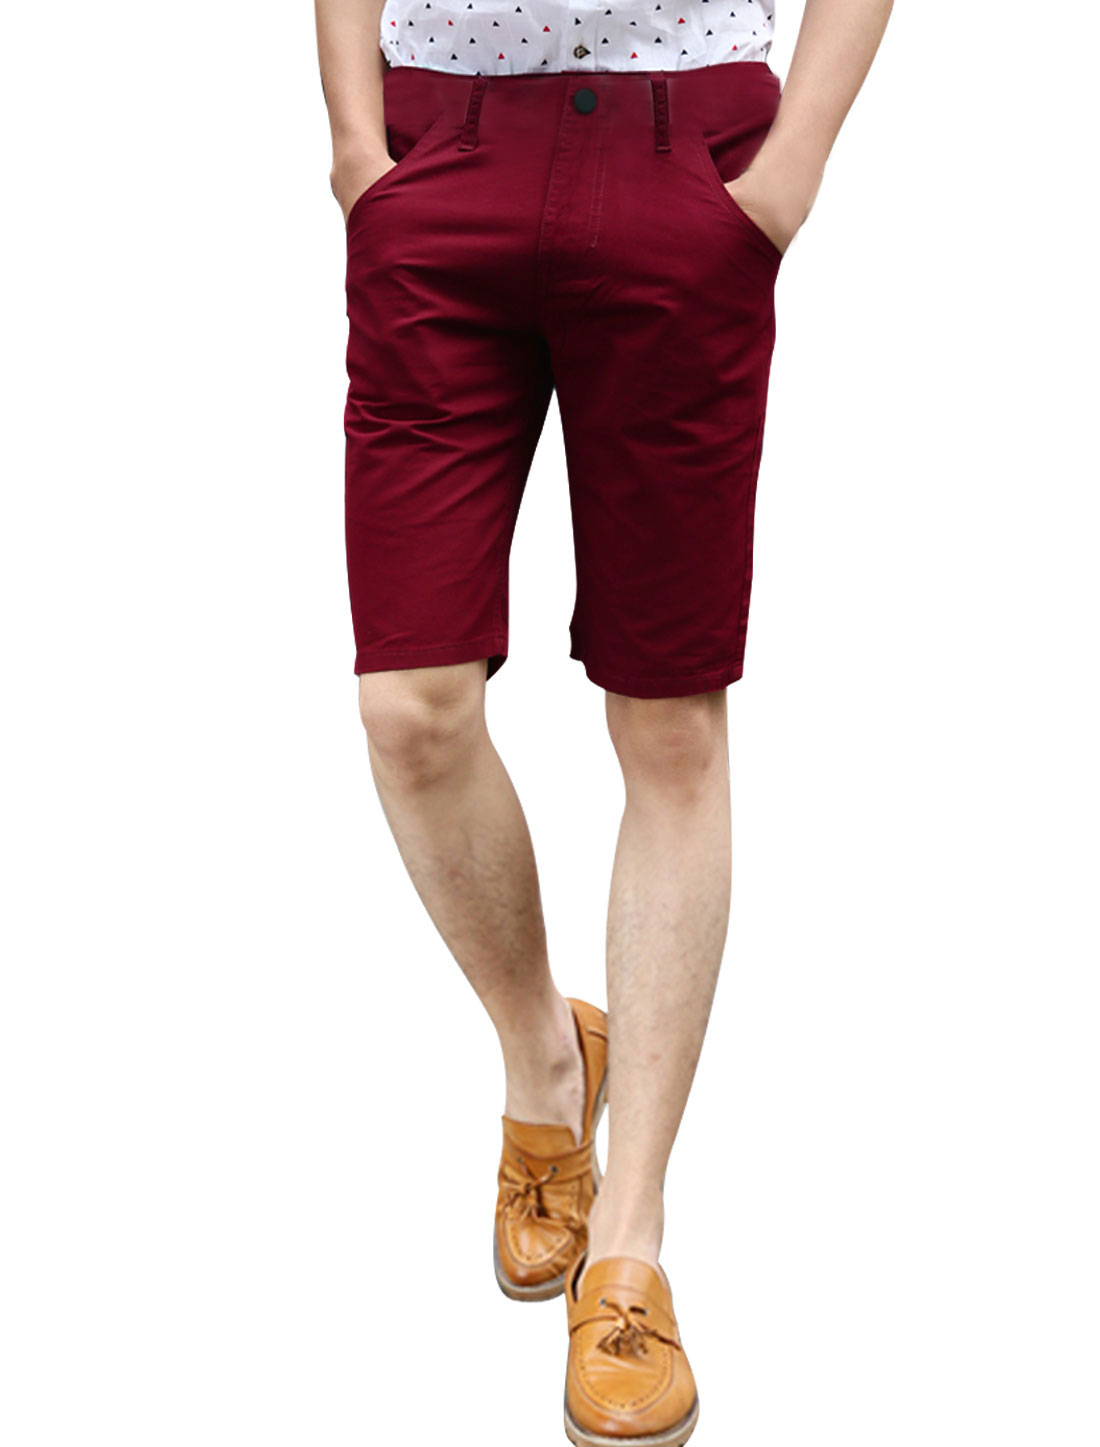 Man Natural Waist Zip Fly Slanted Pockets Casual Shorts Burgundy W34